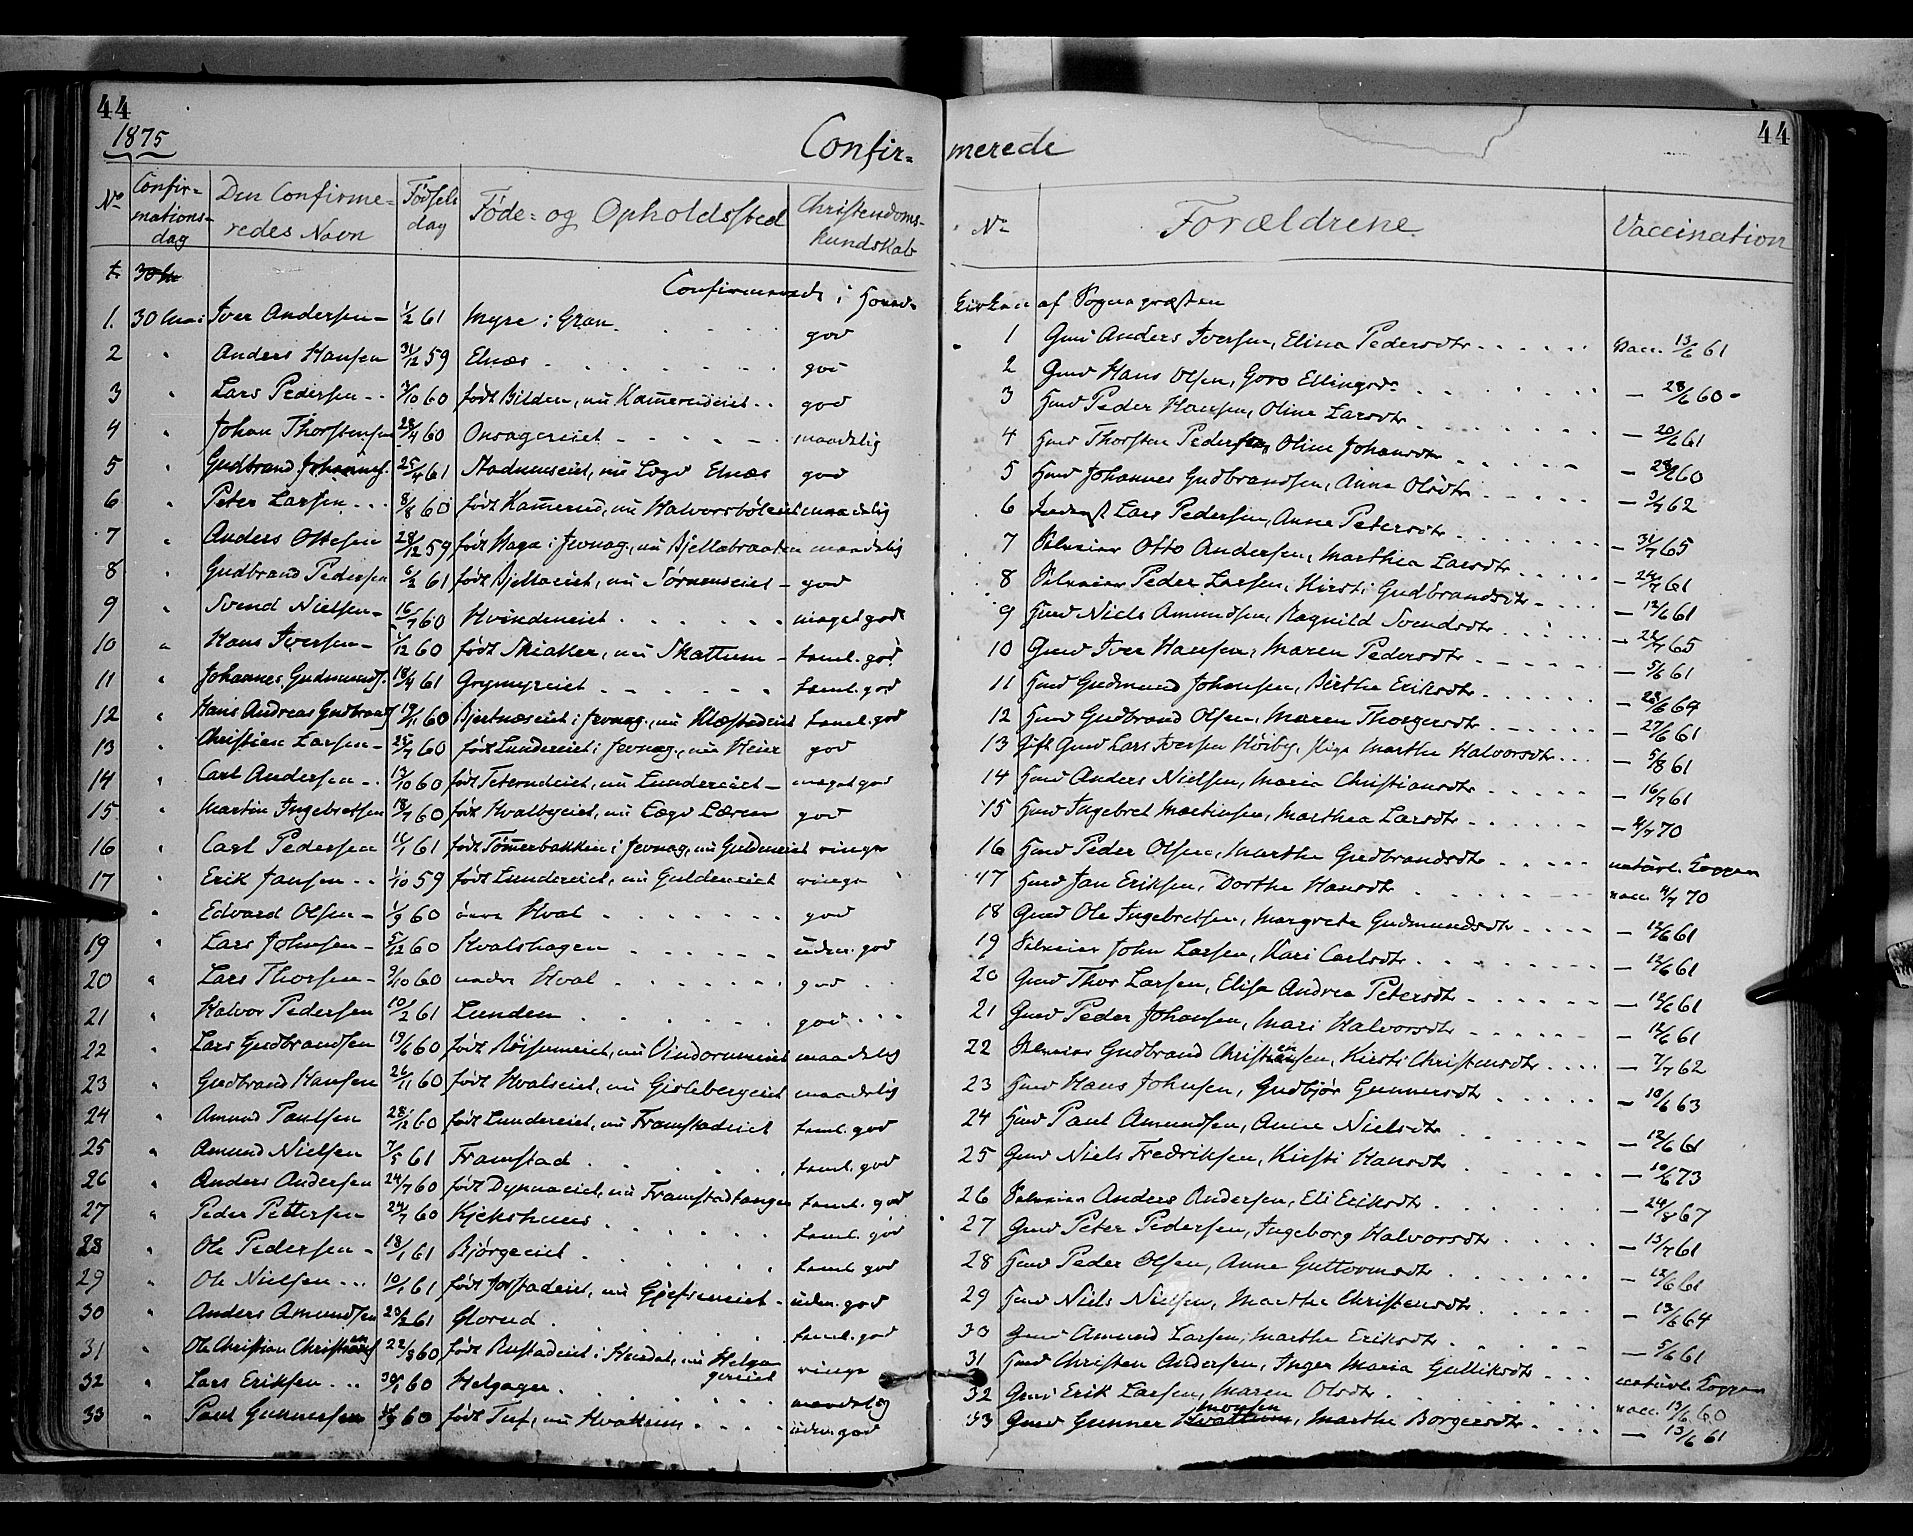 SAH, Gran prestekontor, Ministerialbok nr. 13, 1875-1879, s. 44